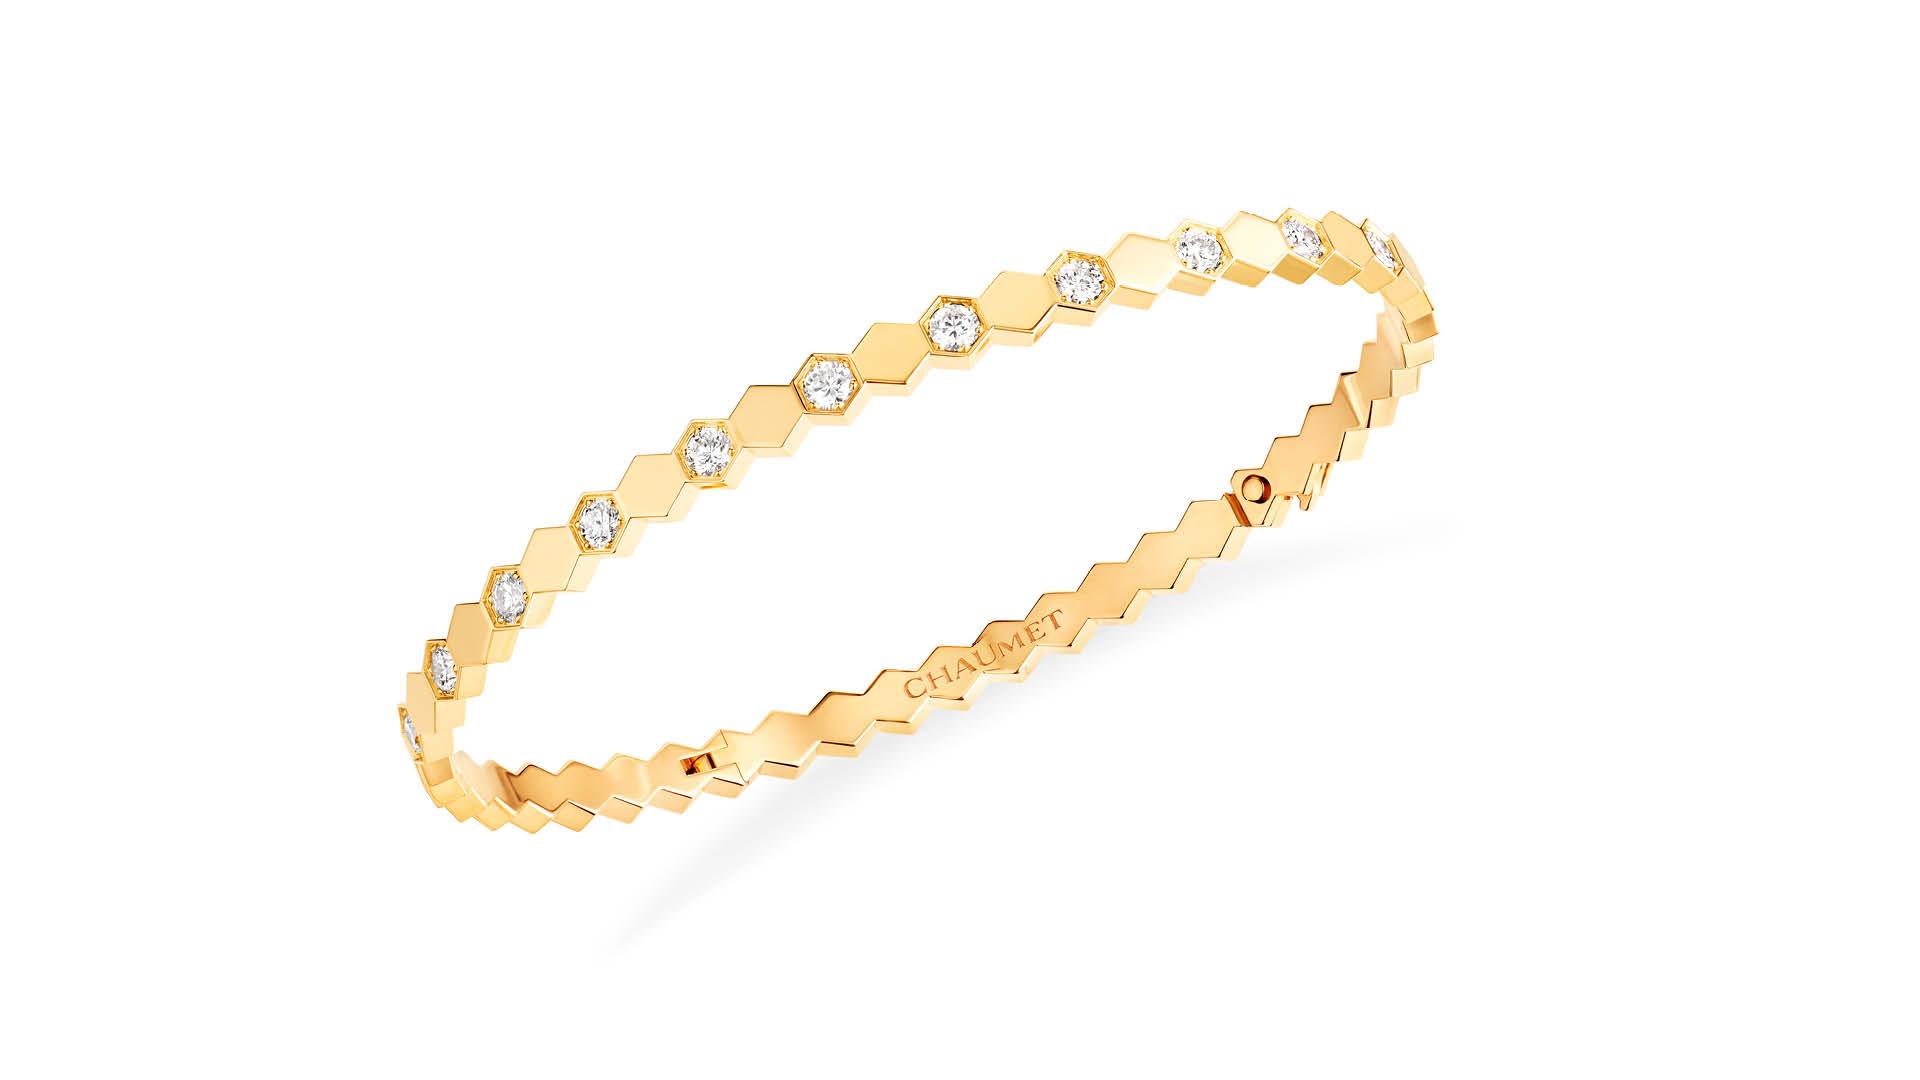 Chaumet-Bee-My-Love-Bracelet-Half-Paved